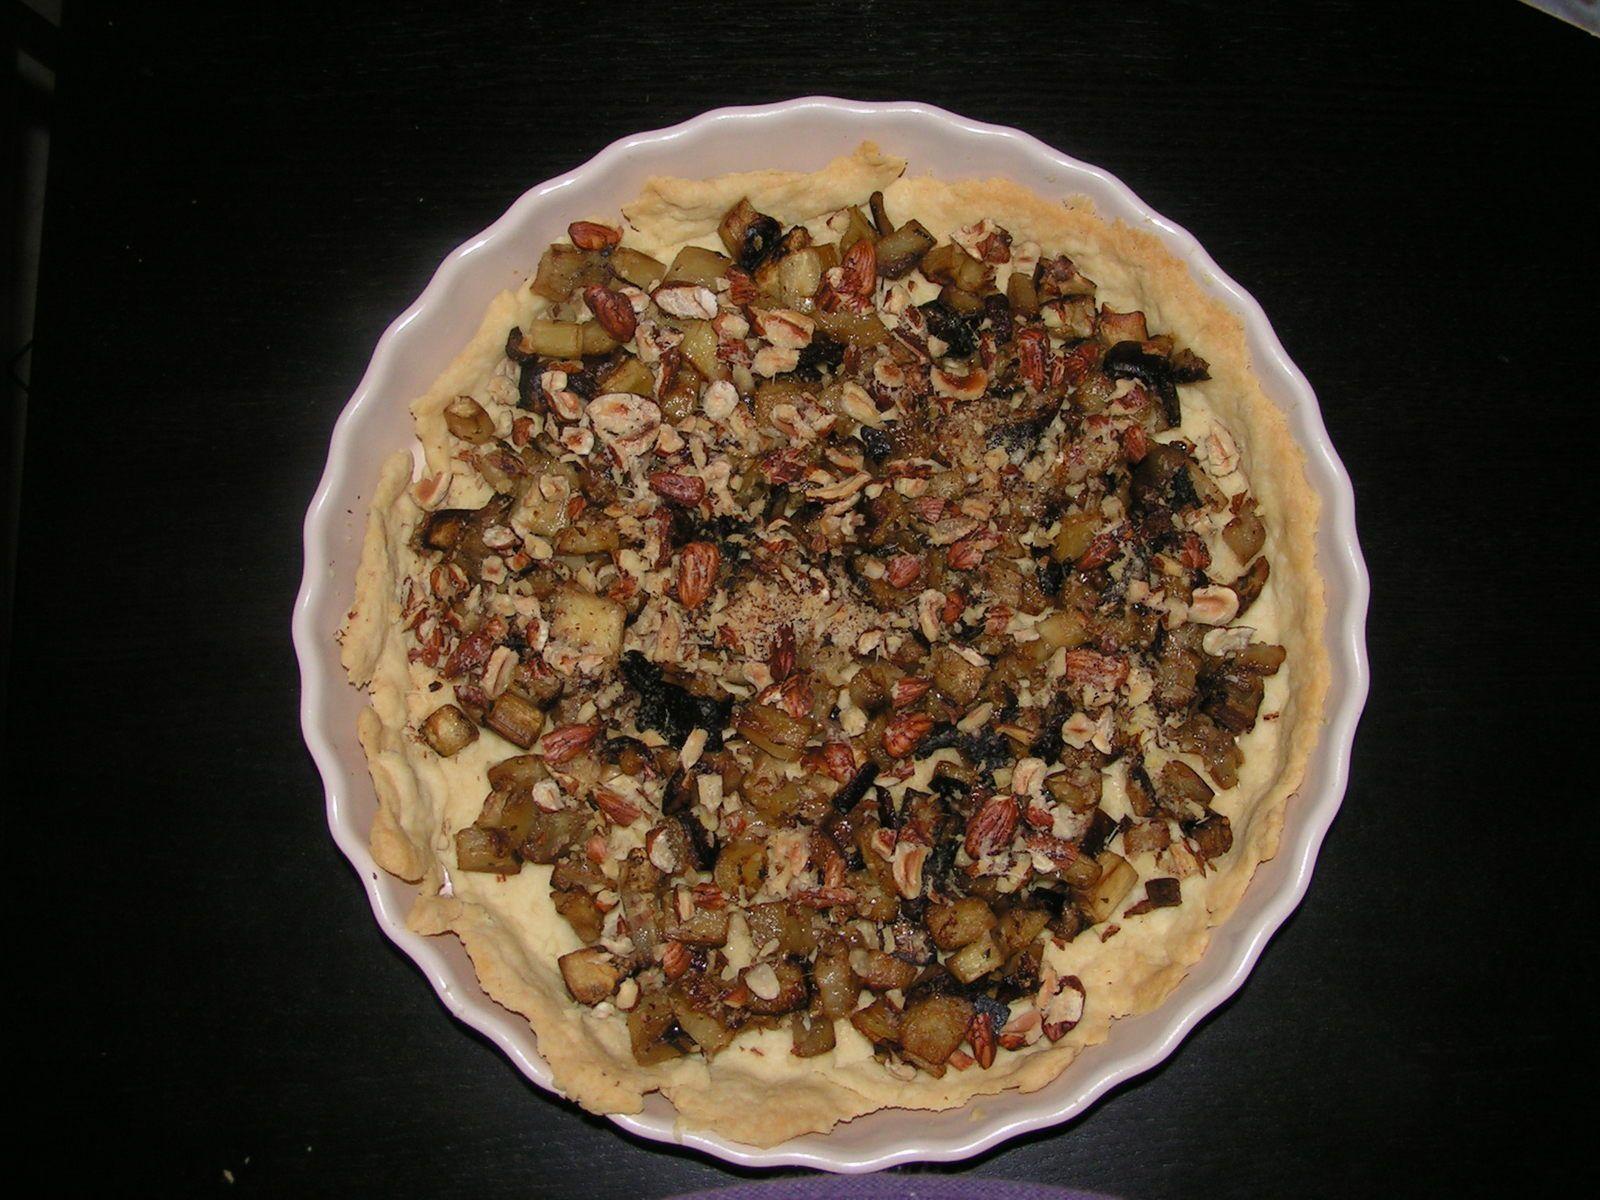 tarte aux aubergines et noisettes